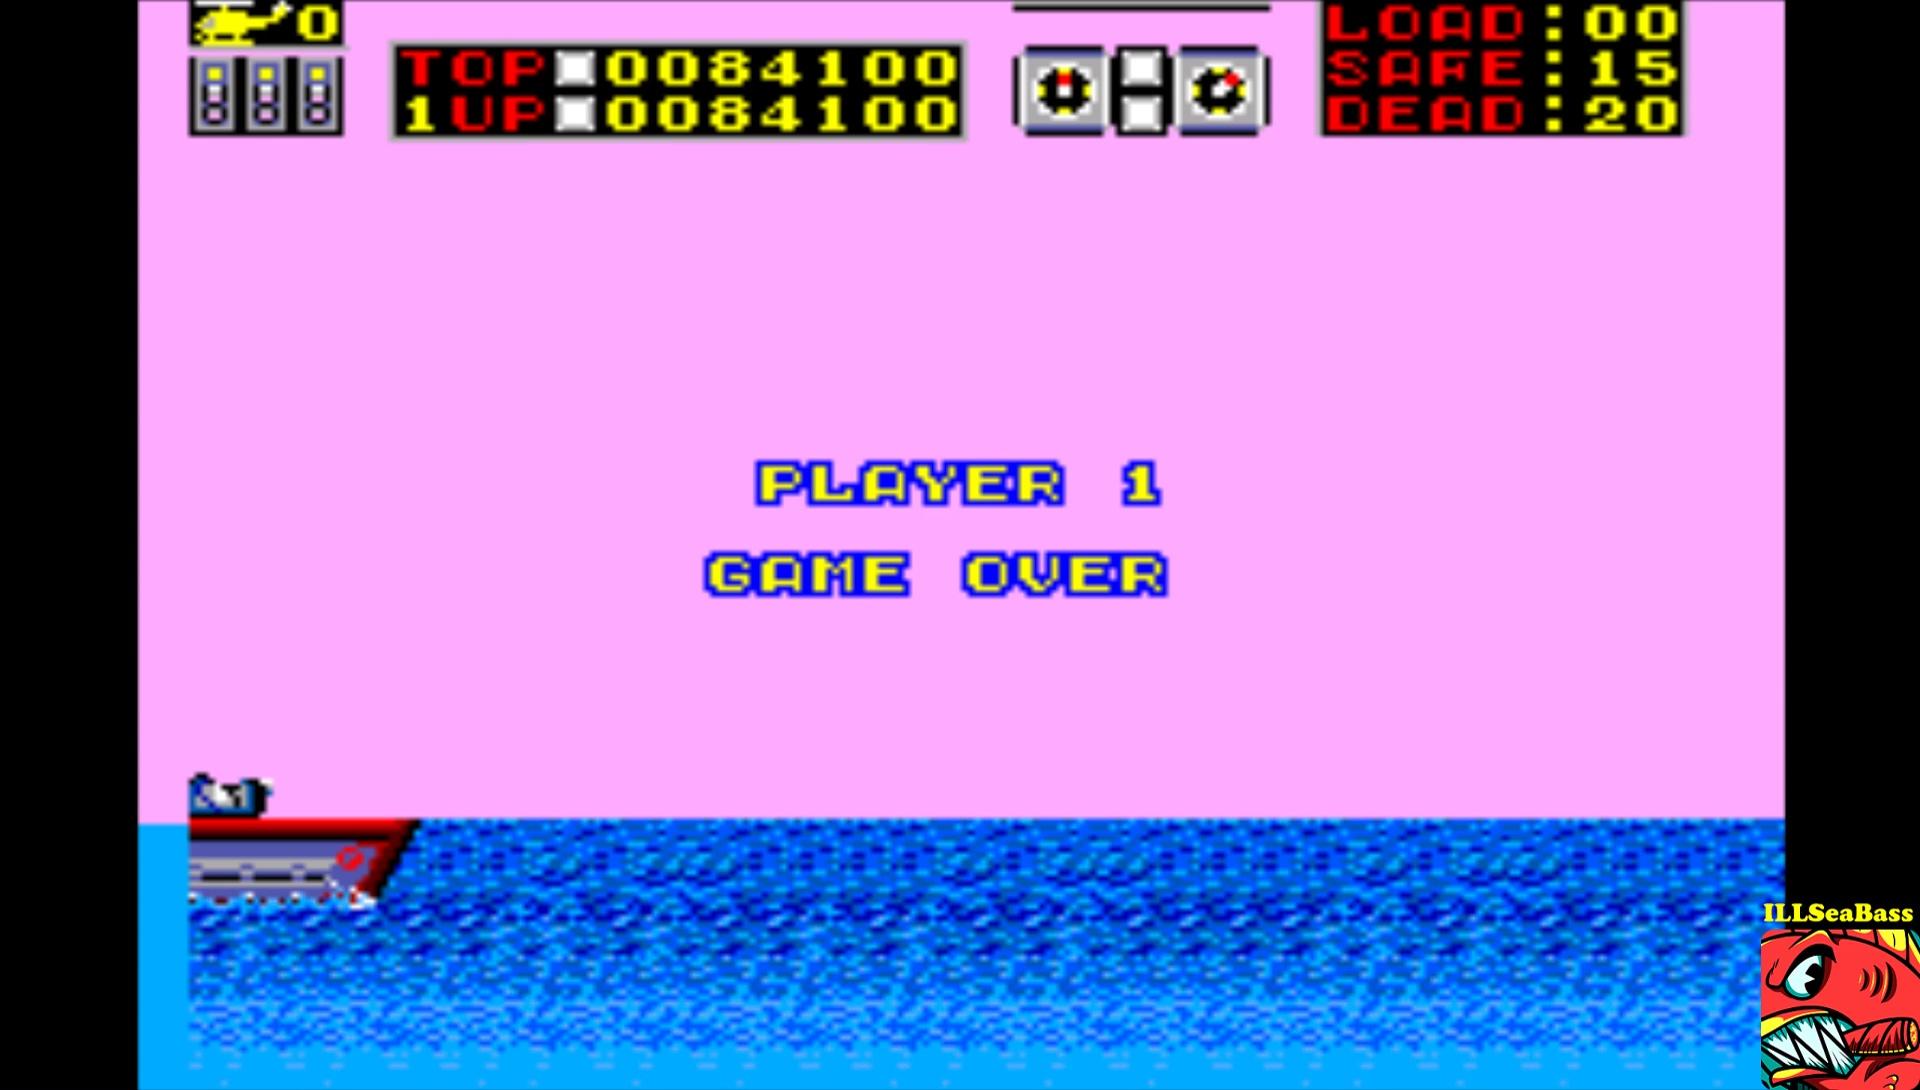 ILLSeaBass: Choplifter (Sega Master System Emulated) 84,100 points on 2017-02-27 21:52:19